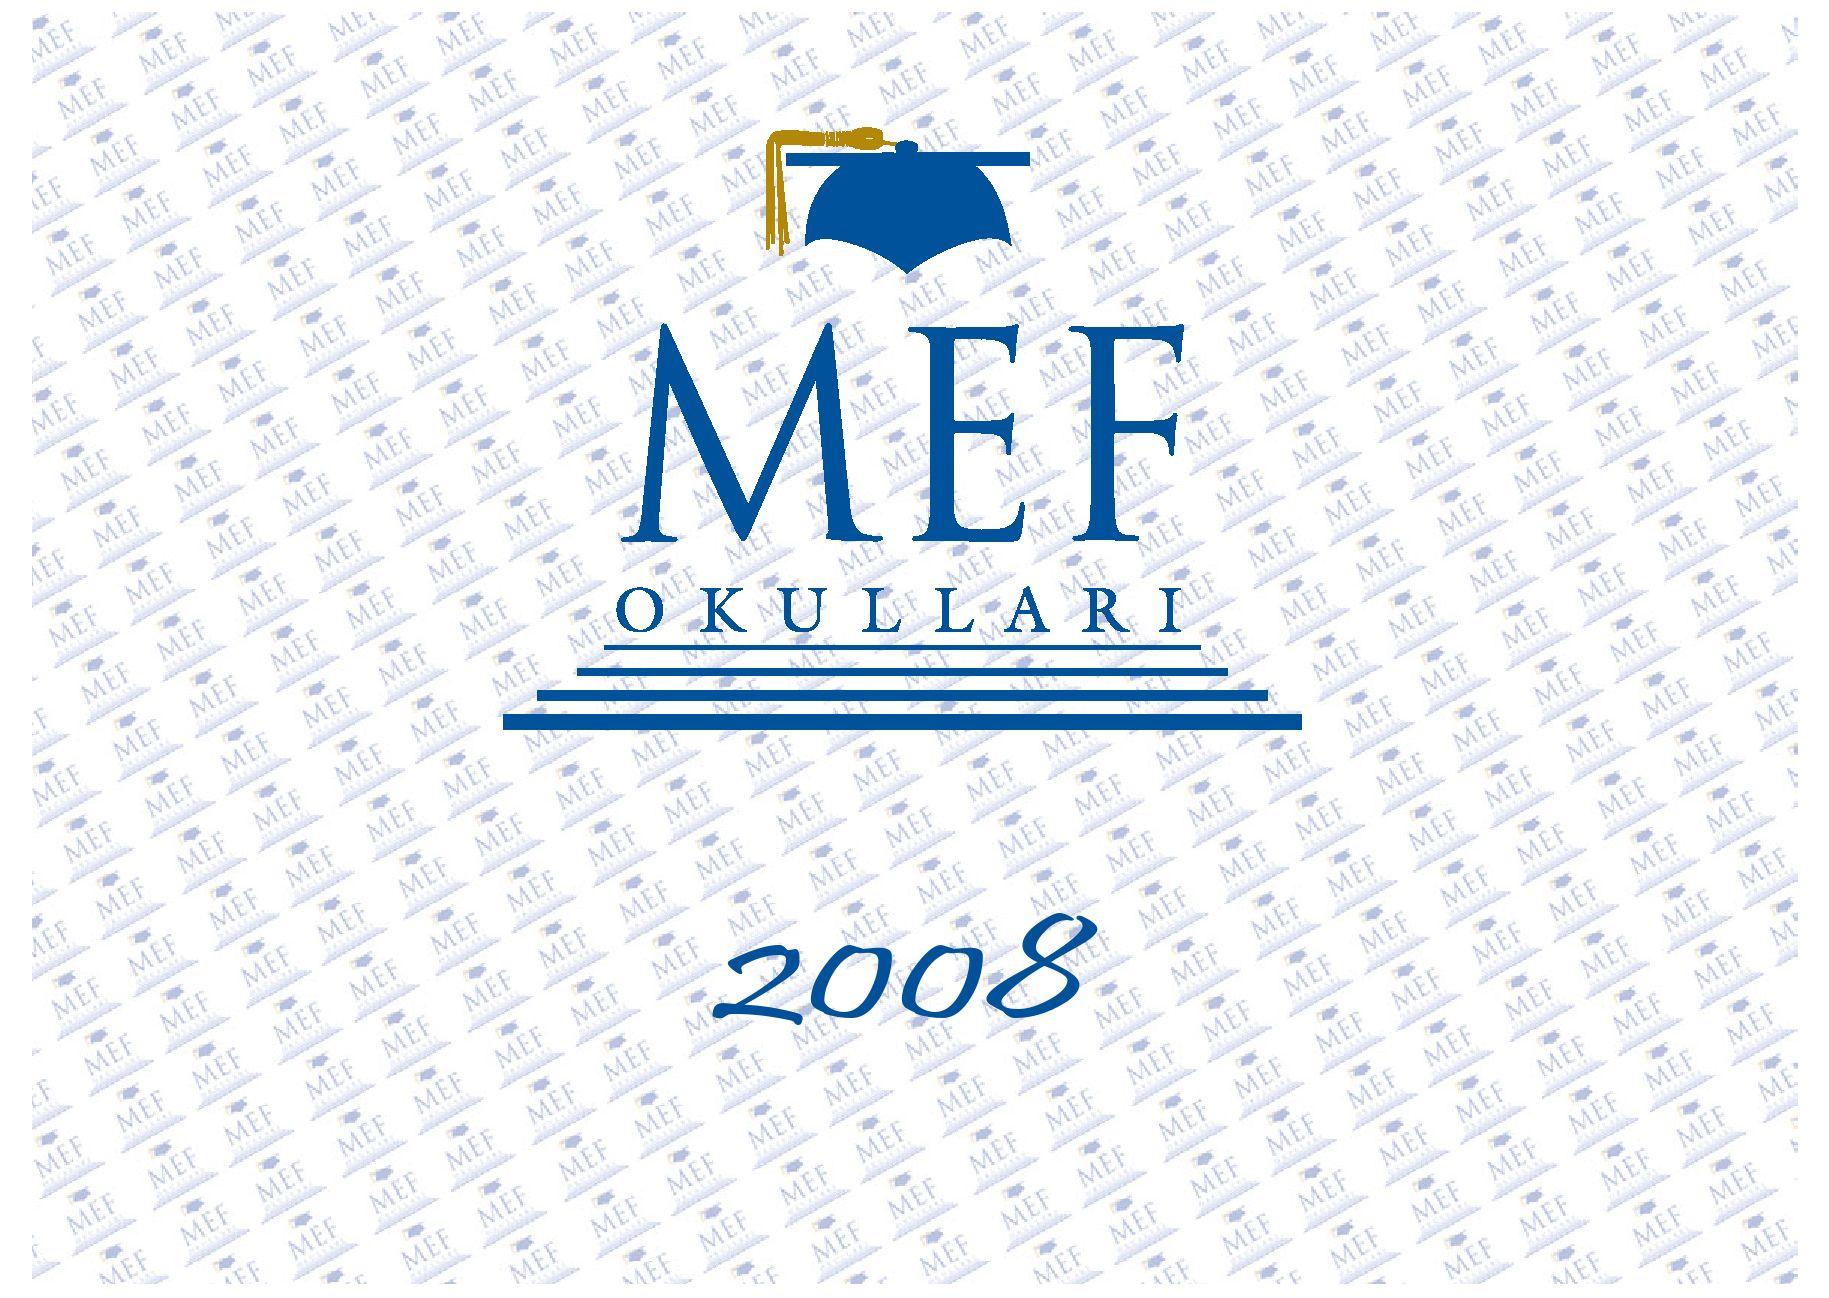 Mef Okullari 2008 By Yeşerim Matbaacılık Issuu